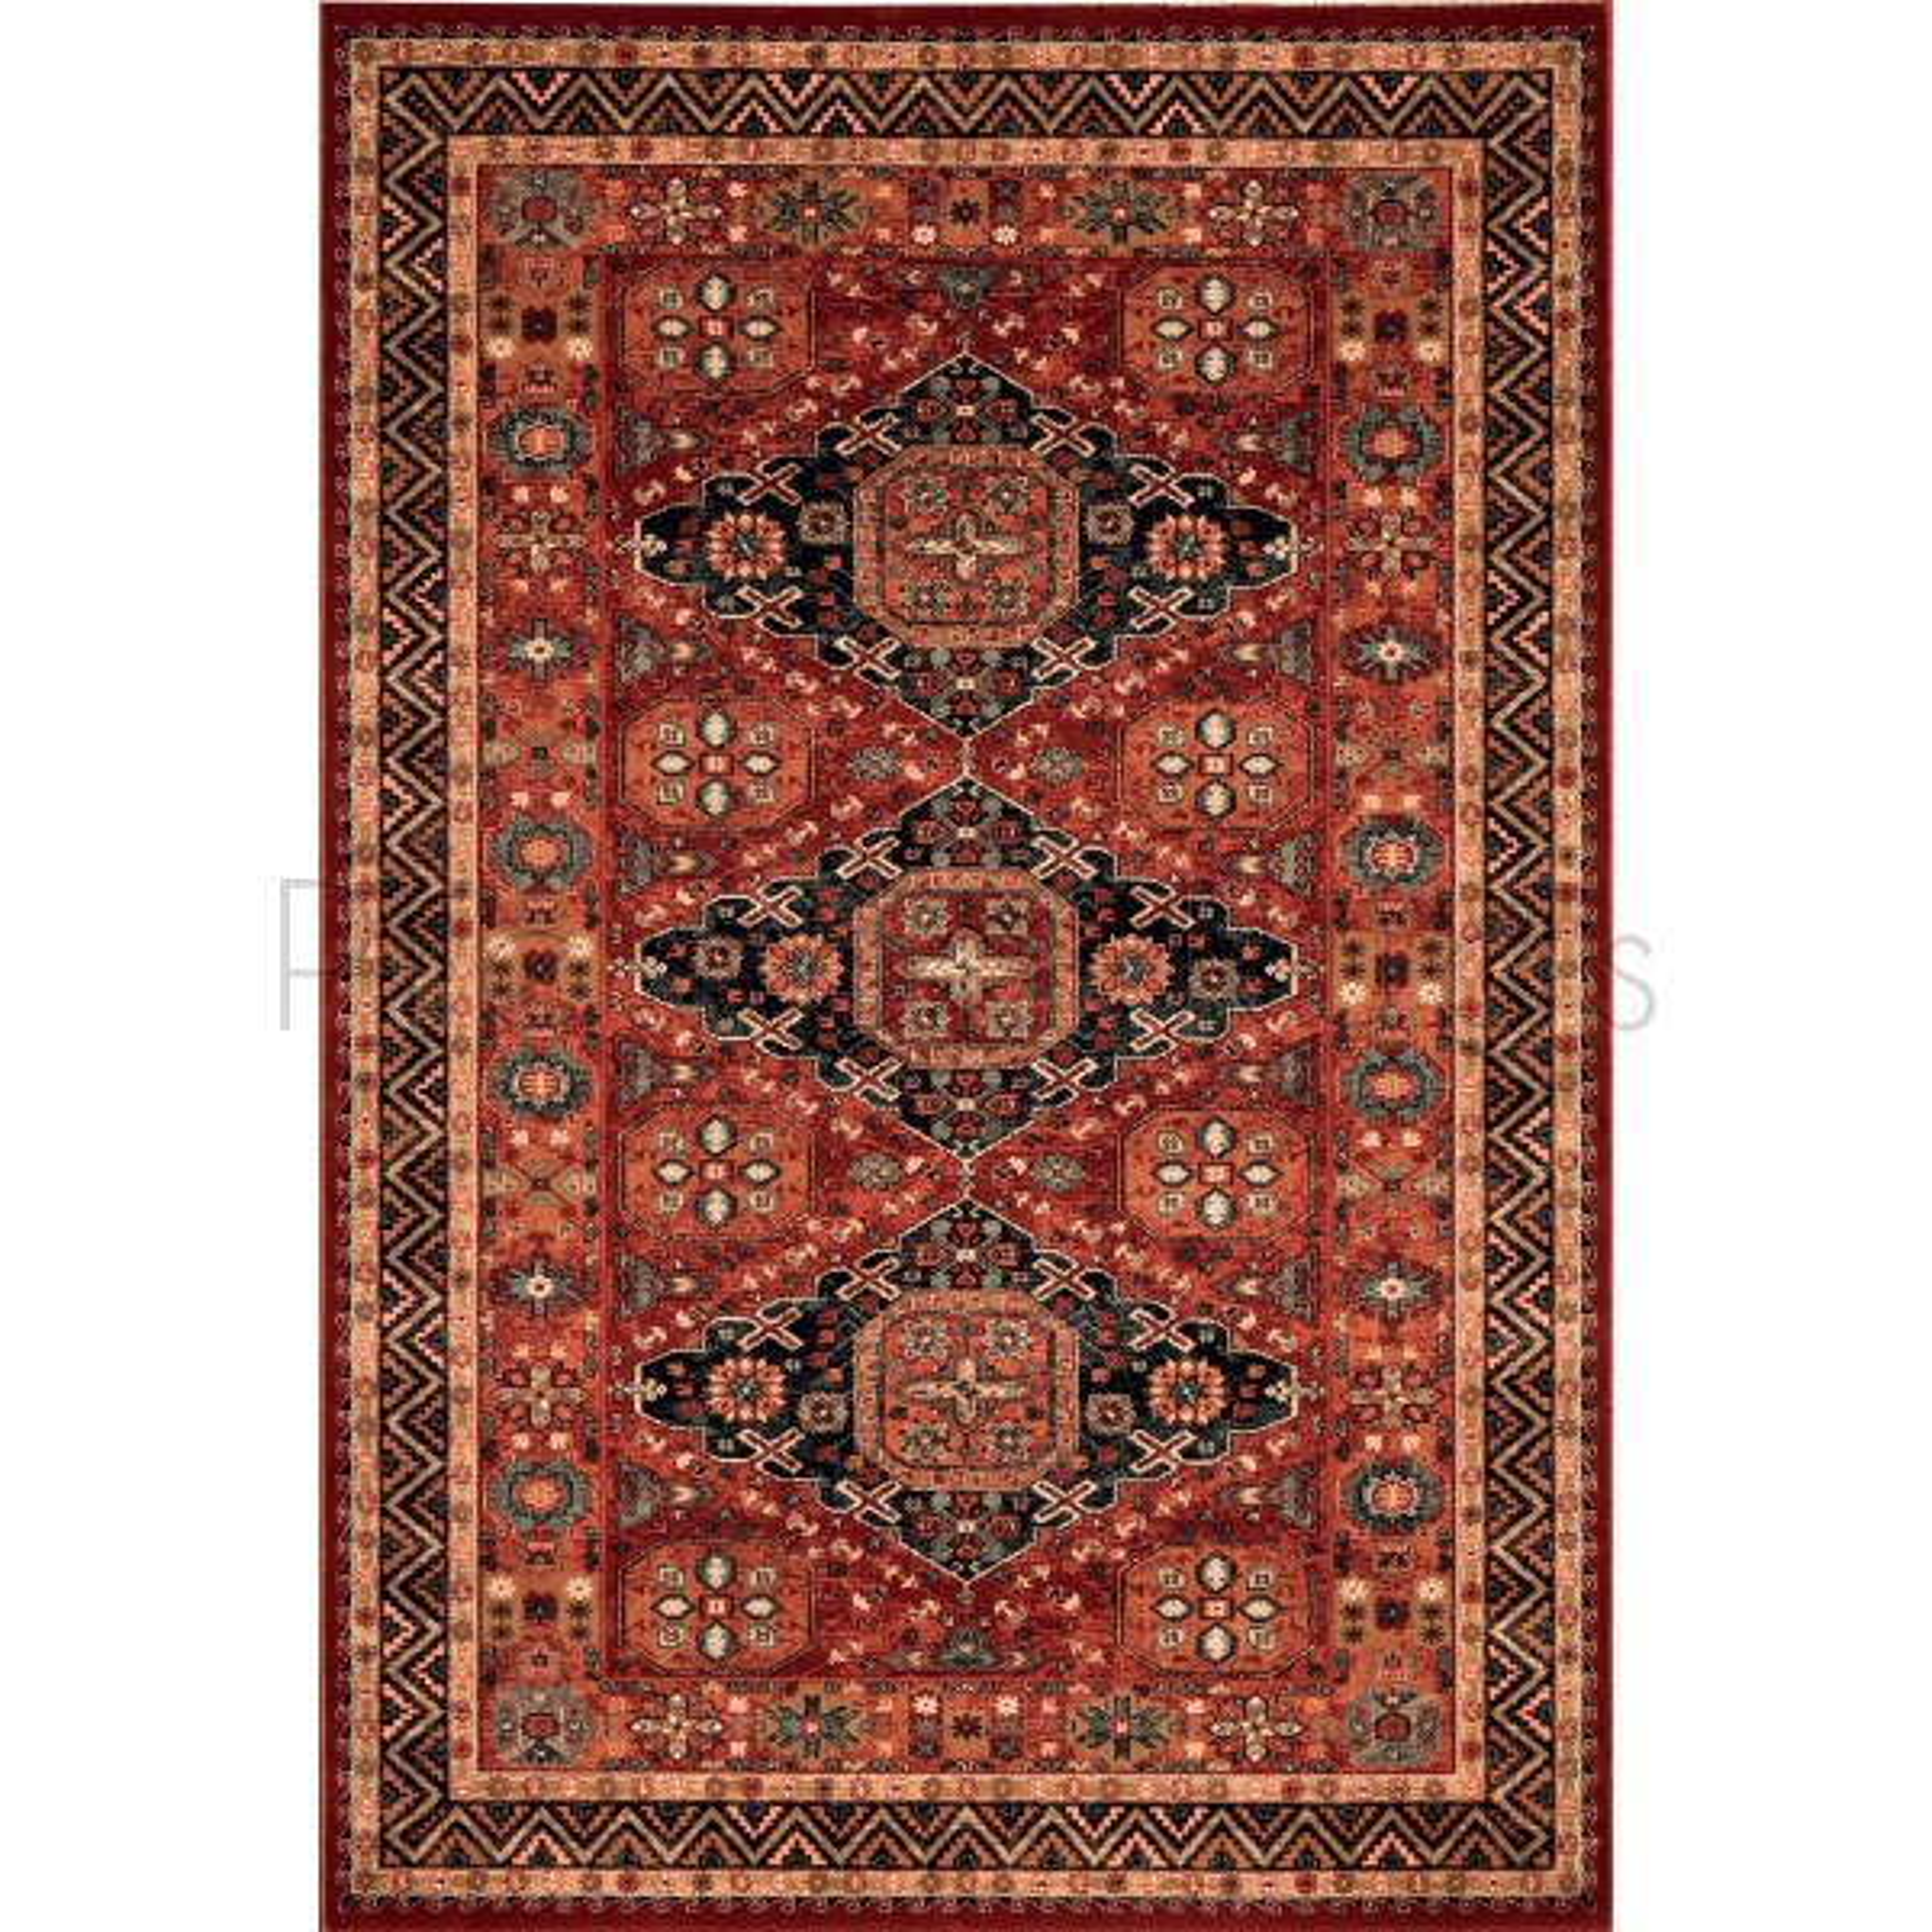 "Kashqai Traditional Persian Design Rug - 4308/300-Runner 67 x 275 cm (2'2"" x 9')"